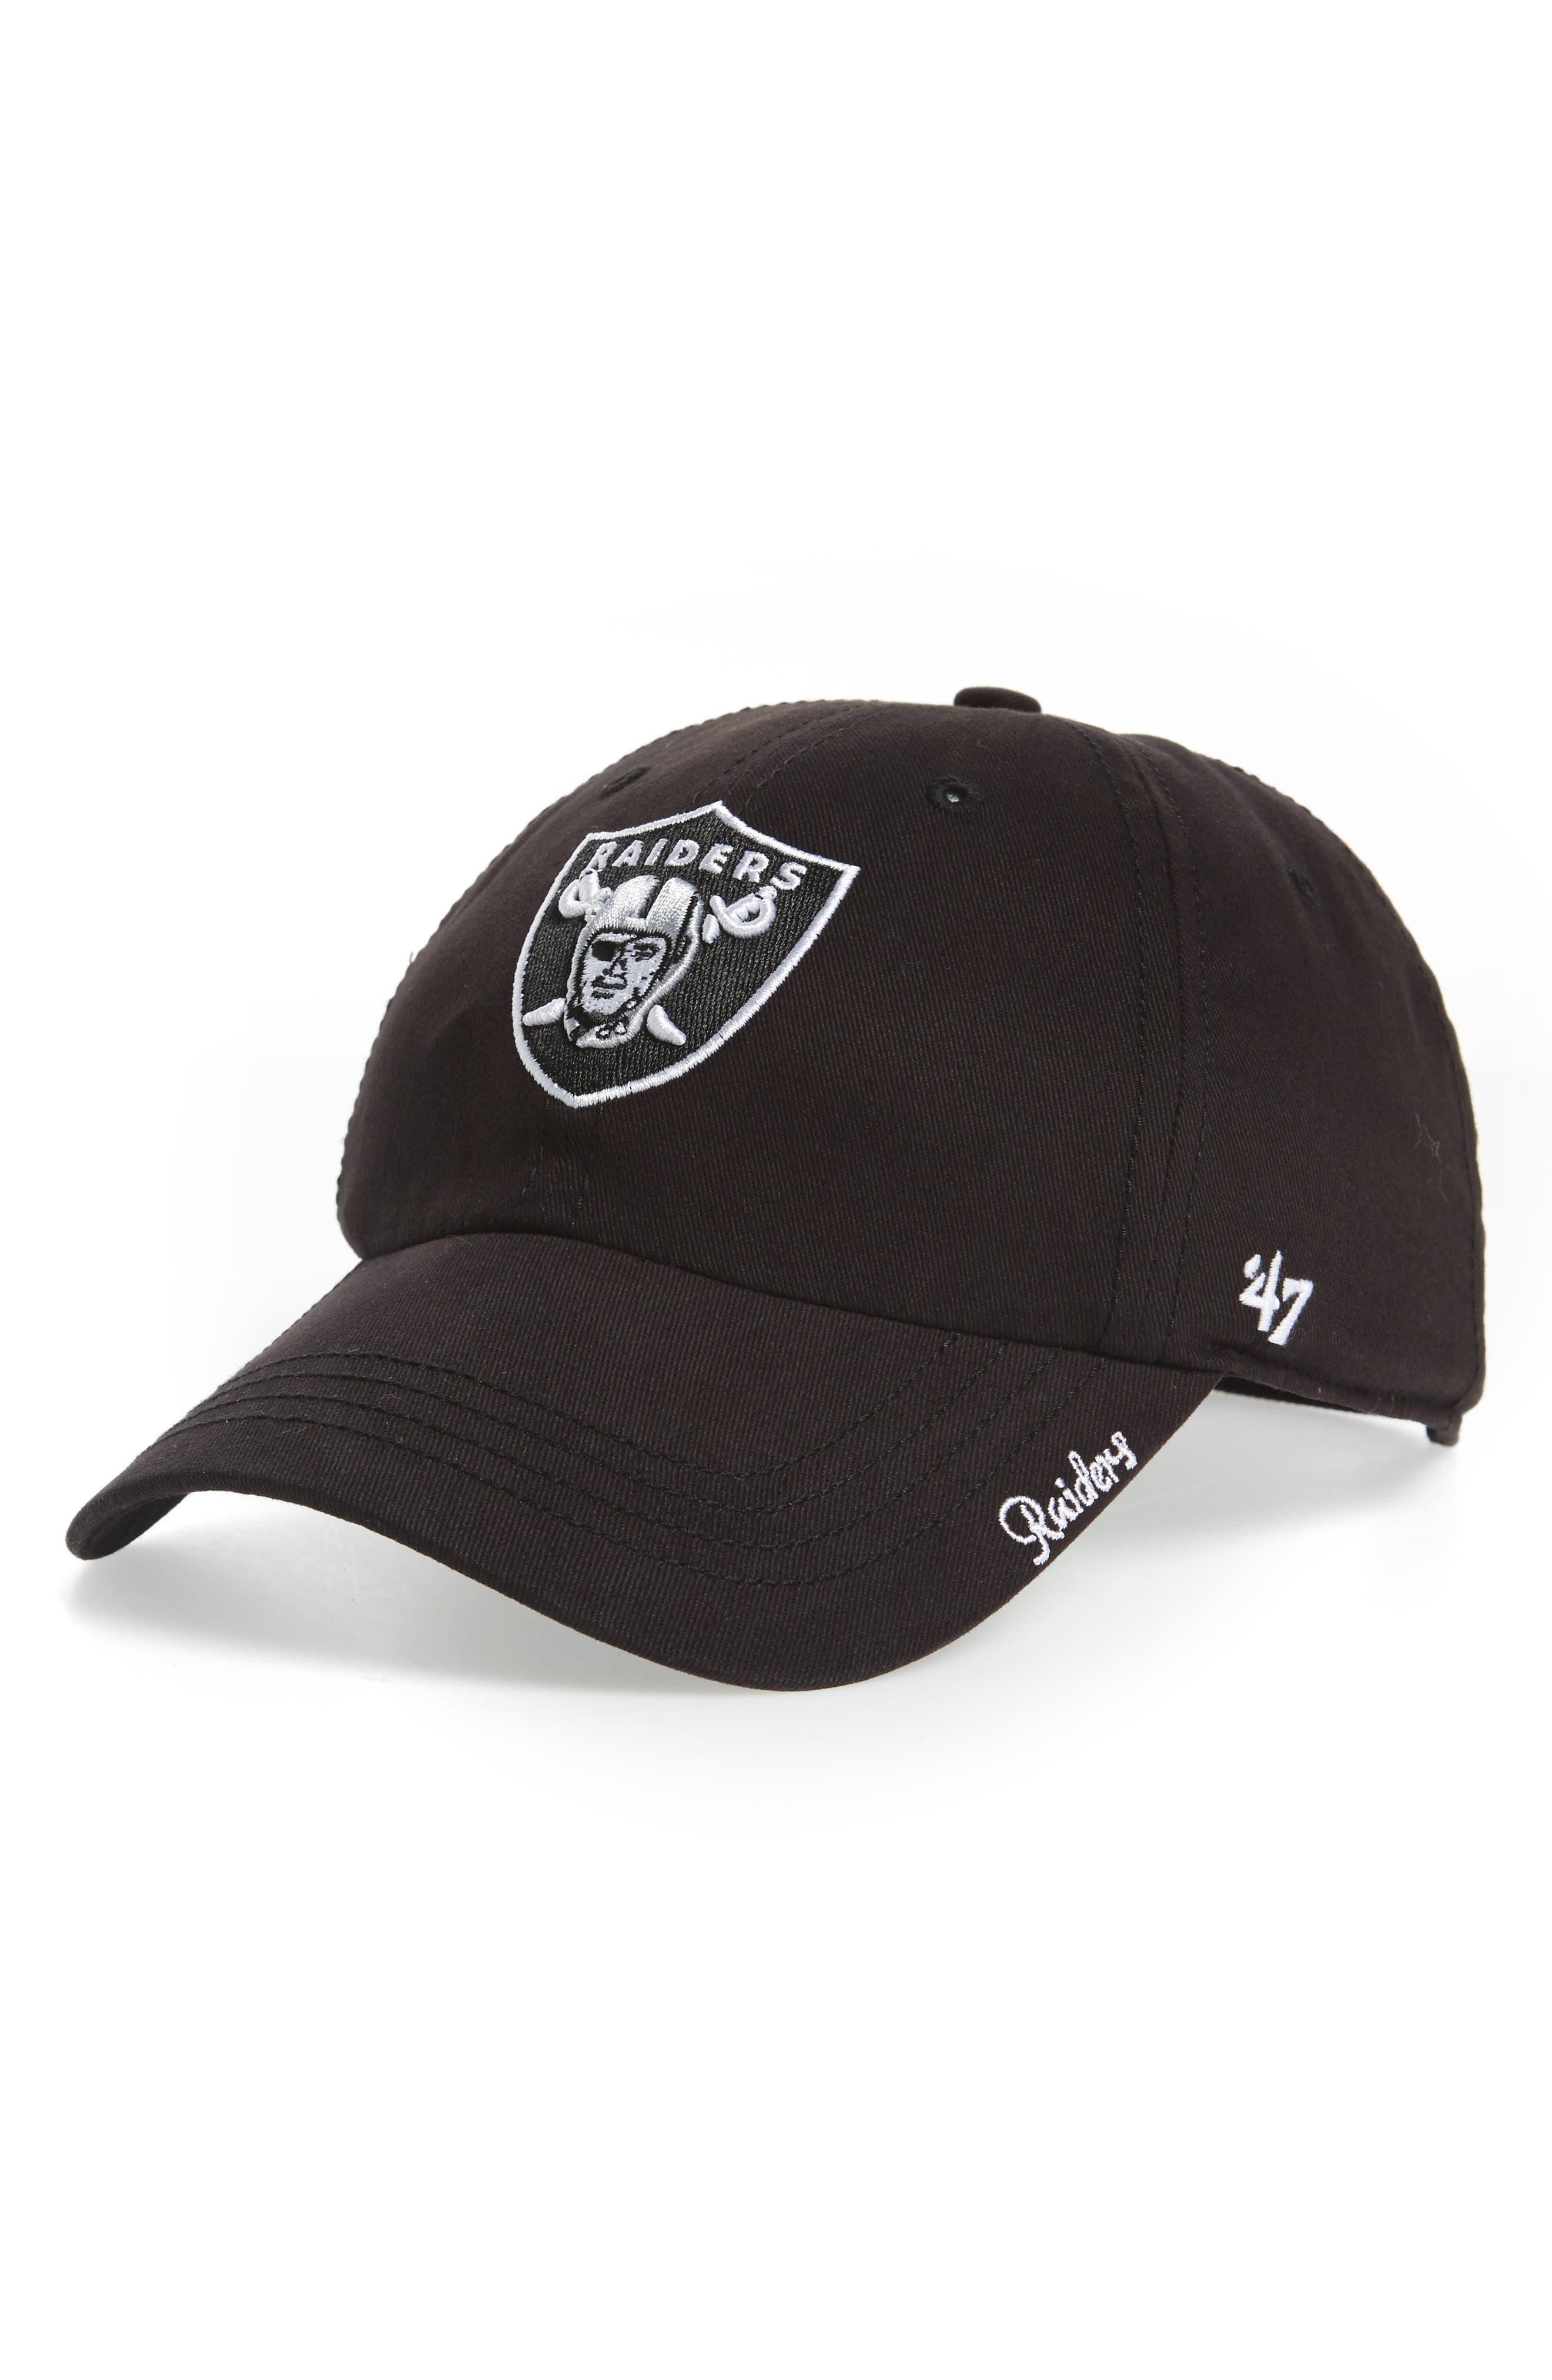 Main Image - '47 Miata Clean Up Oakland Raiders Ball Cap